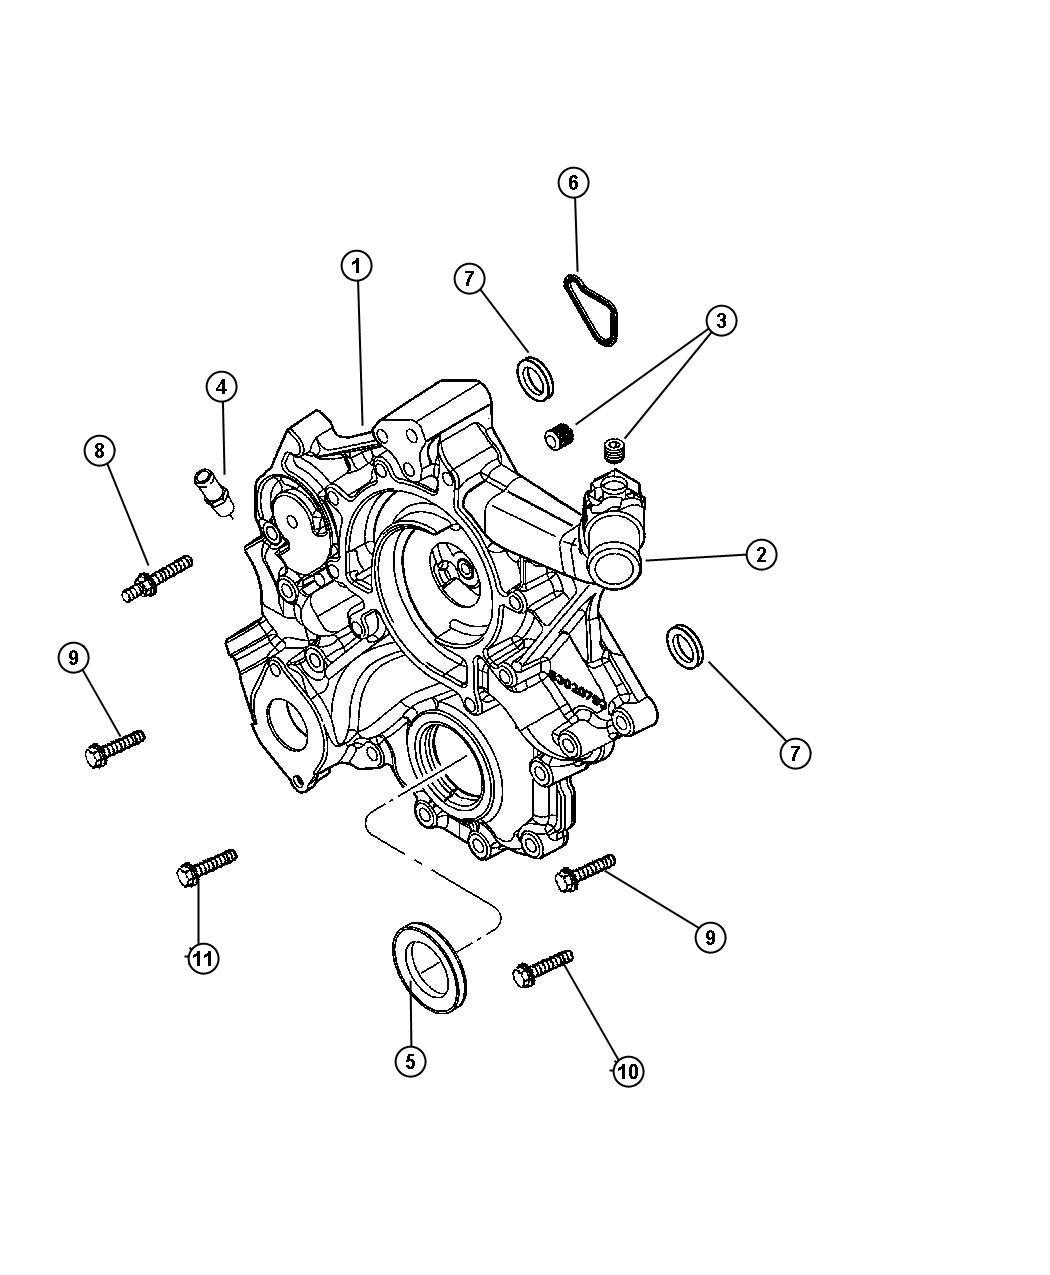 Dodge Ram Bolt Screw Hex Flange Head M10x1